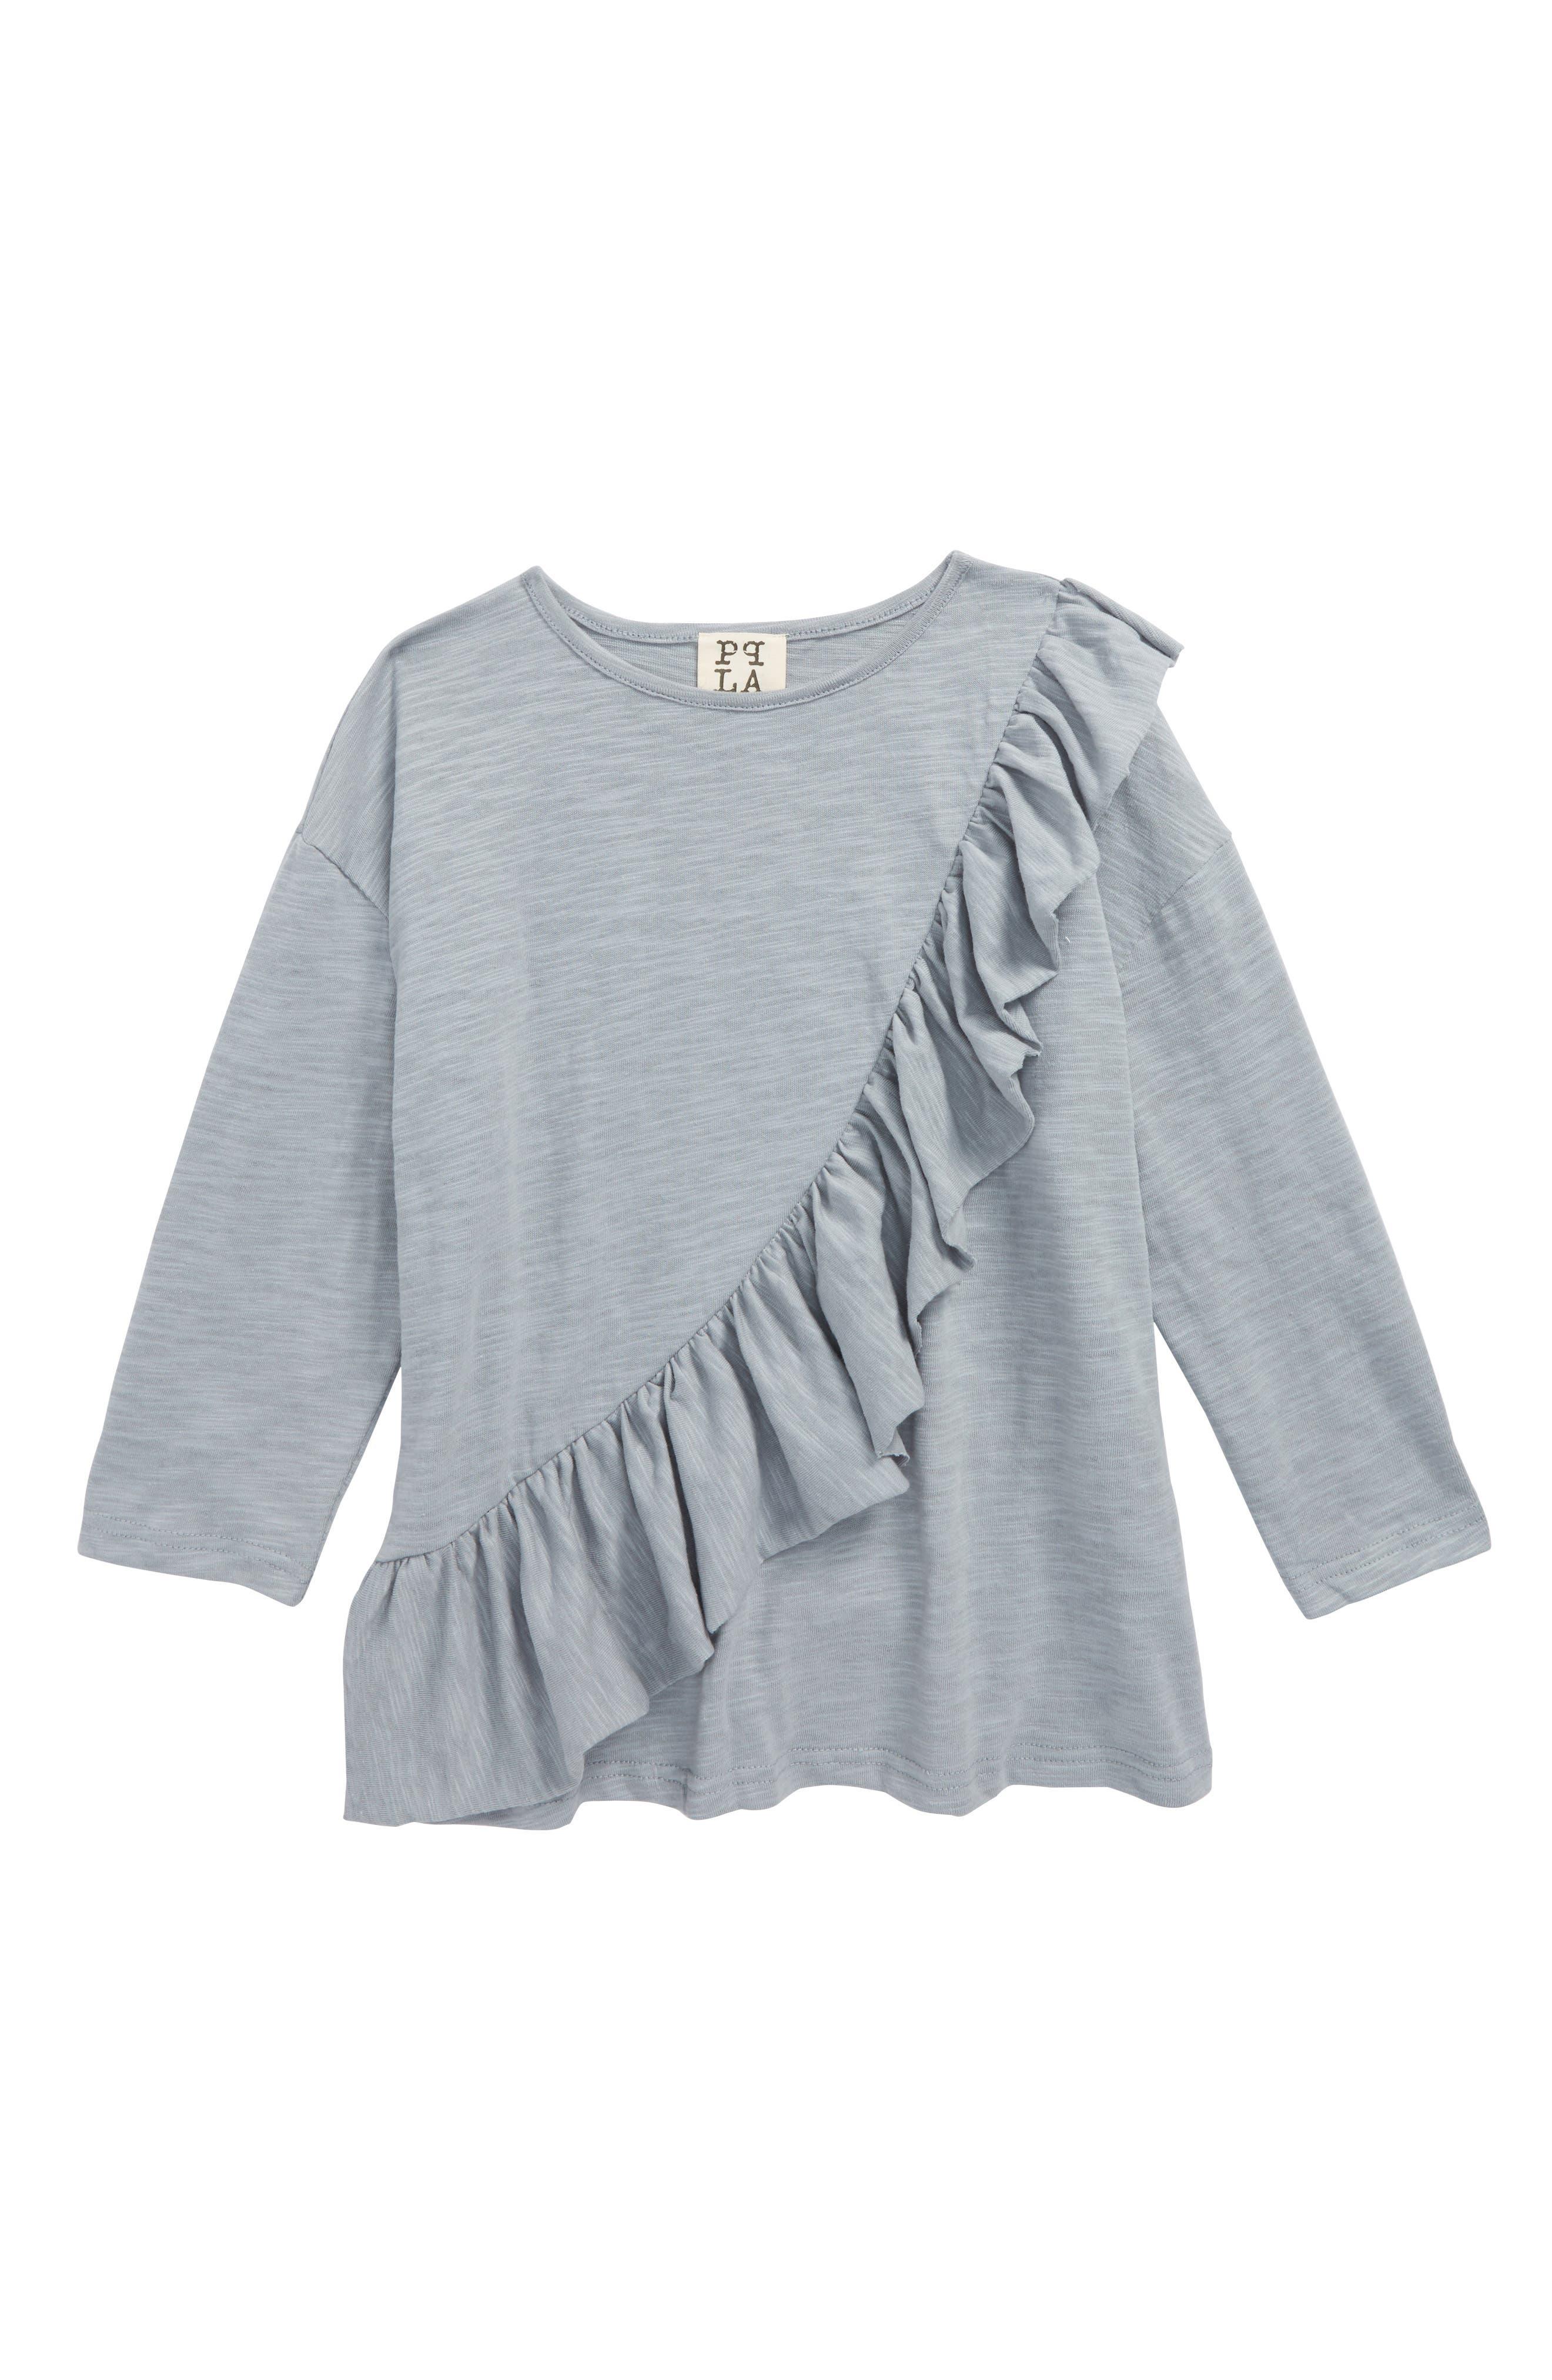 PPLA Silverlake Asymmetrical Ruffle Top (Big Girls)